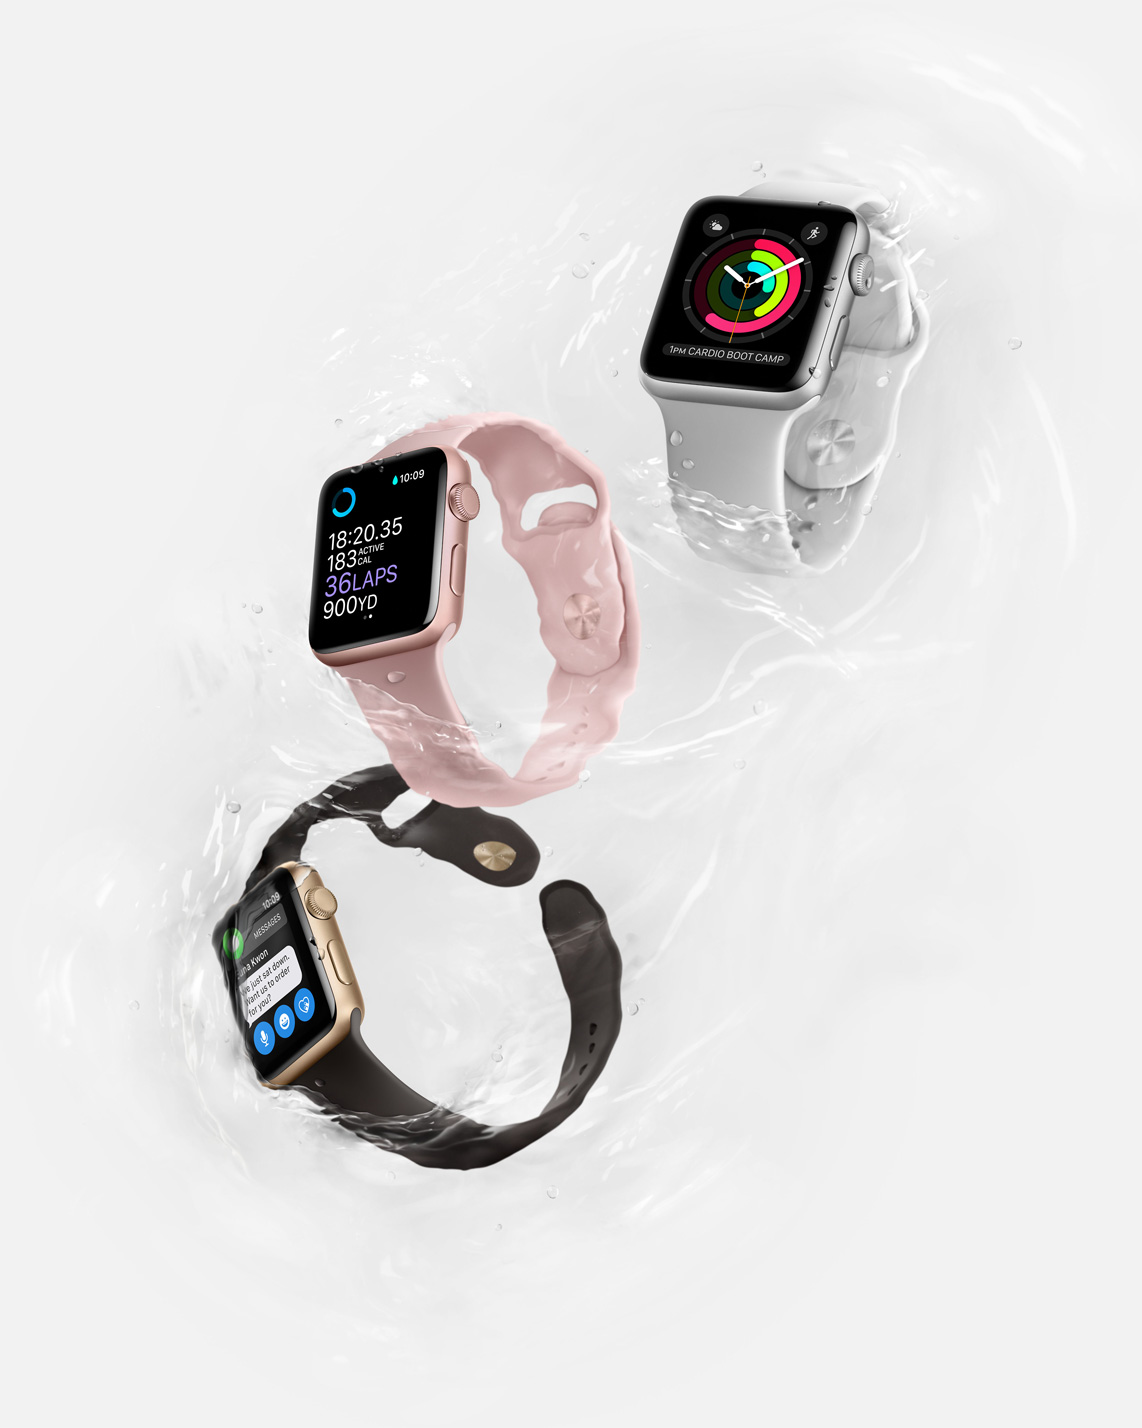 Conheça o Apple Watch 2